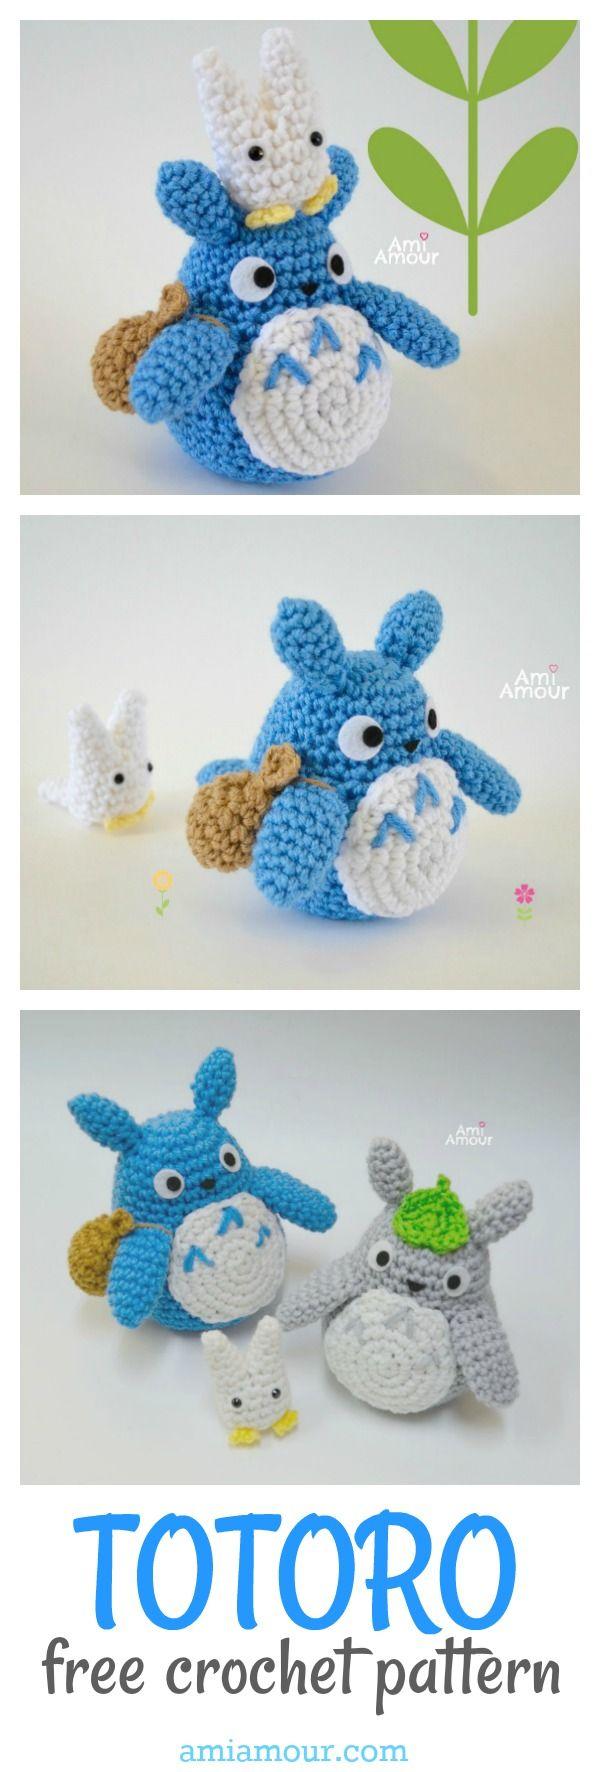 1326 best Crochet images on Pinterest   Amigurumi, Amigurumi ...